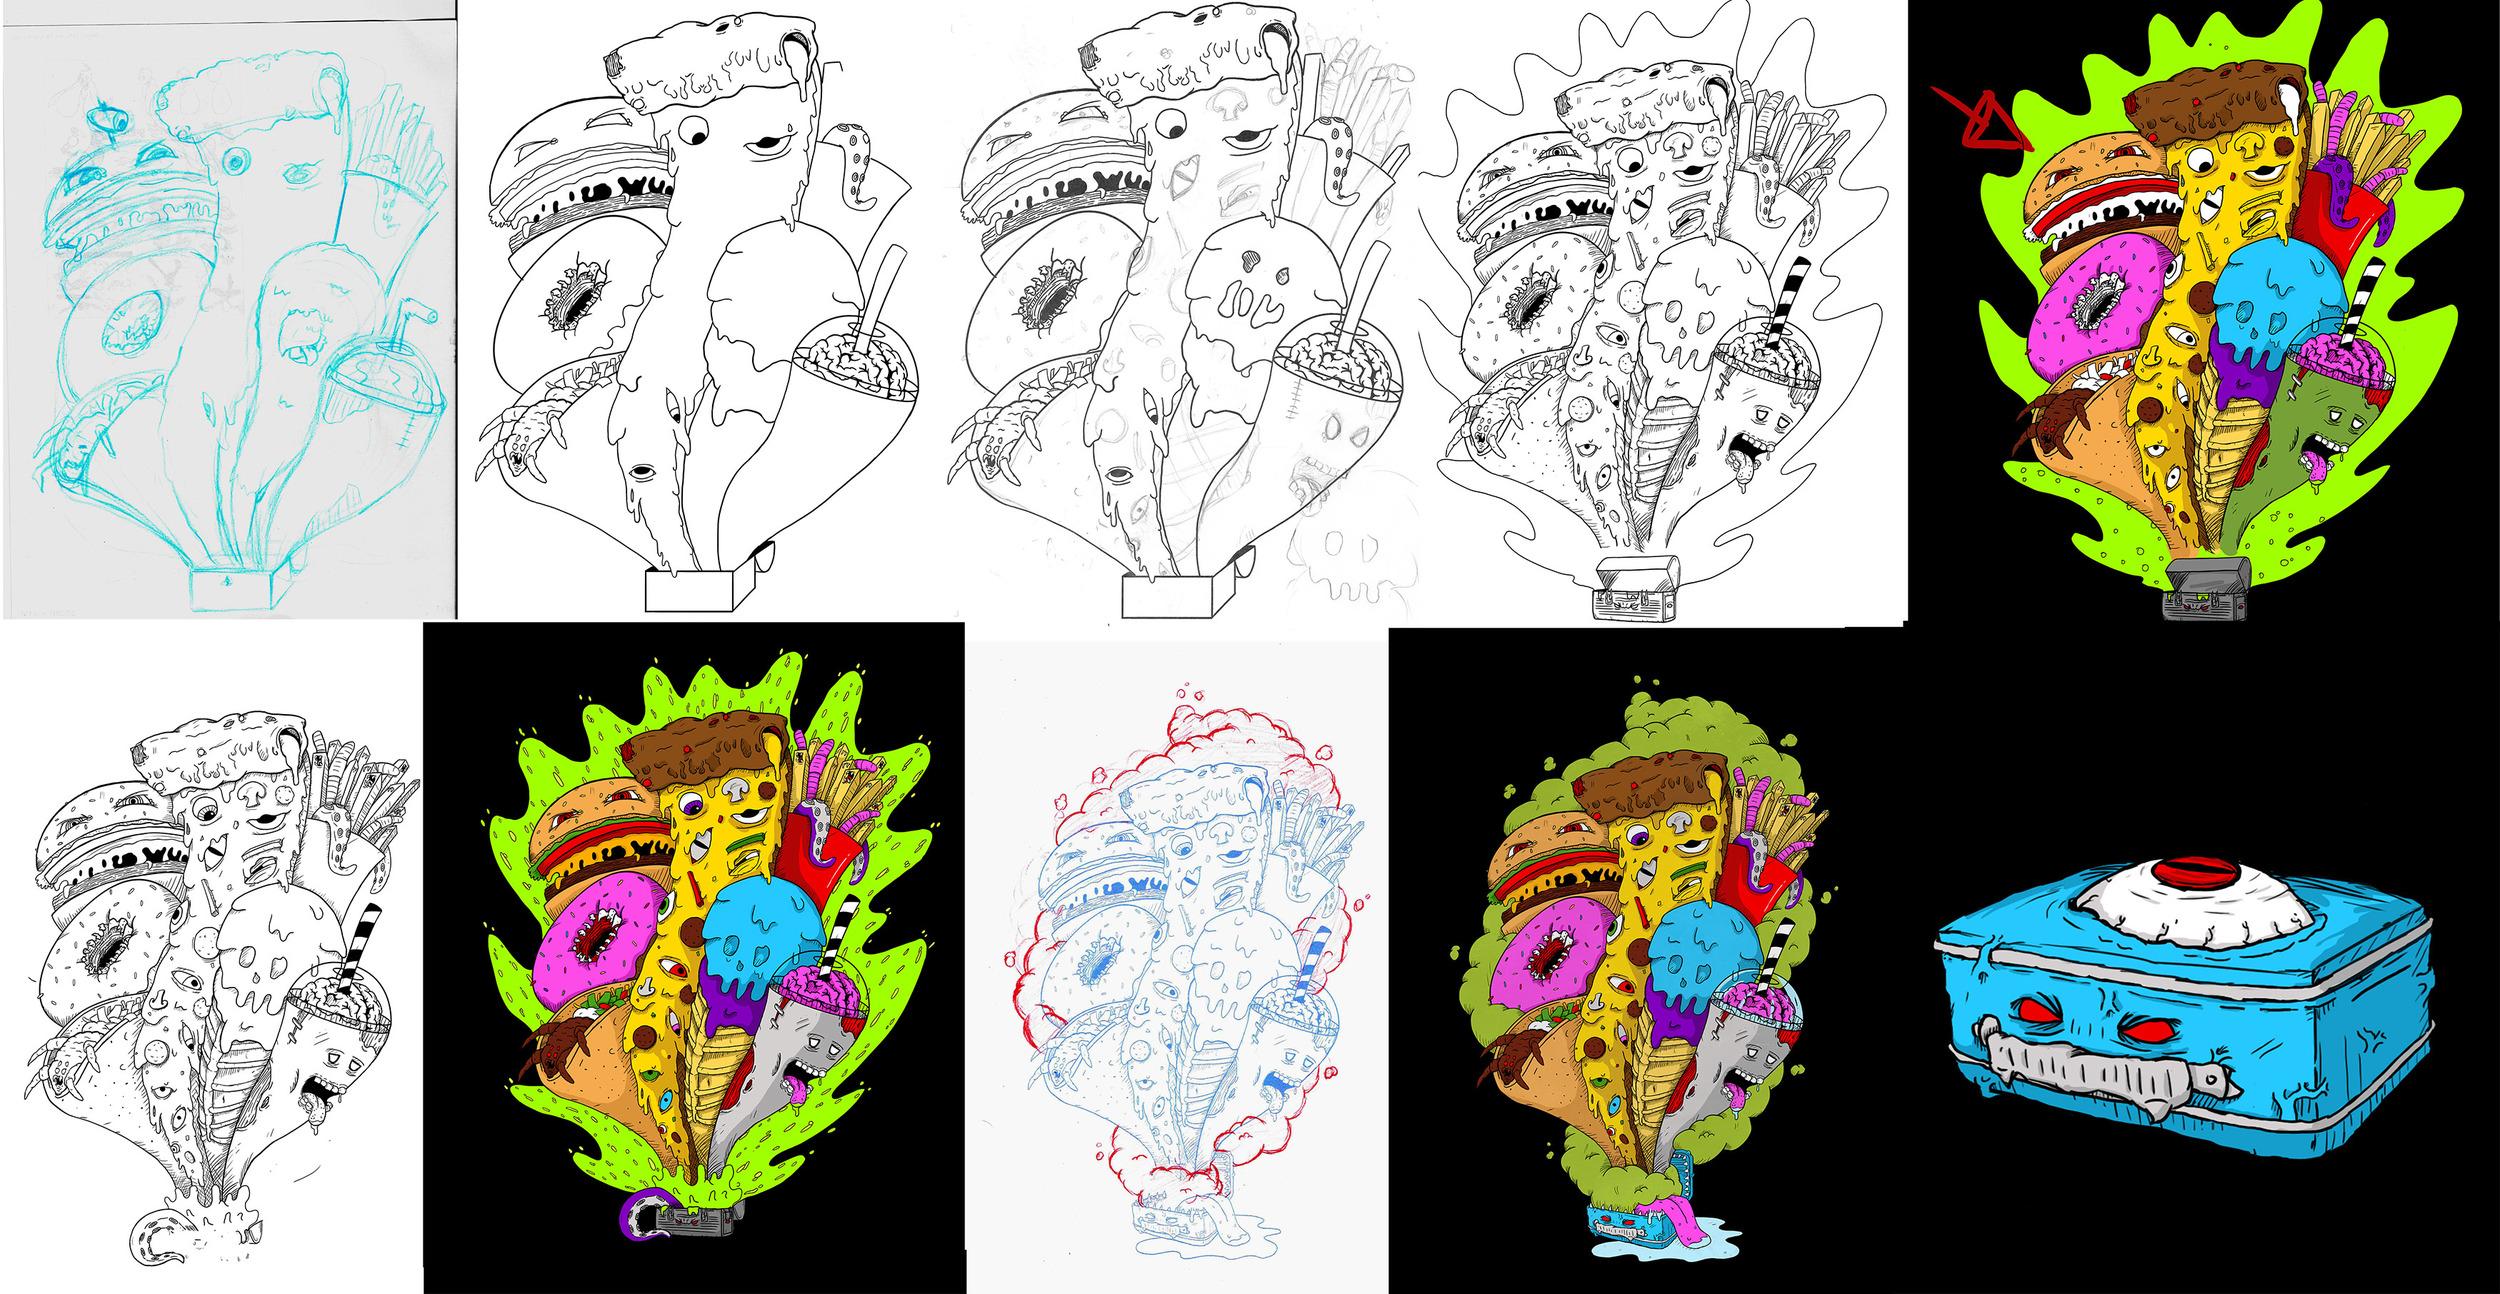 Pandora's Music Box Sketches